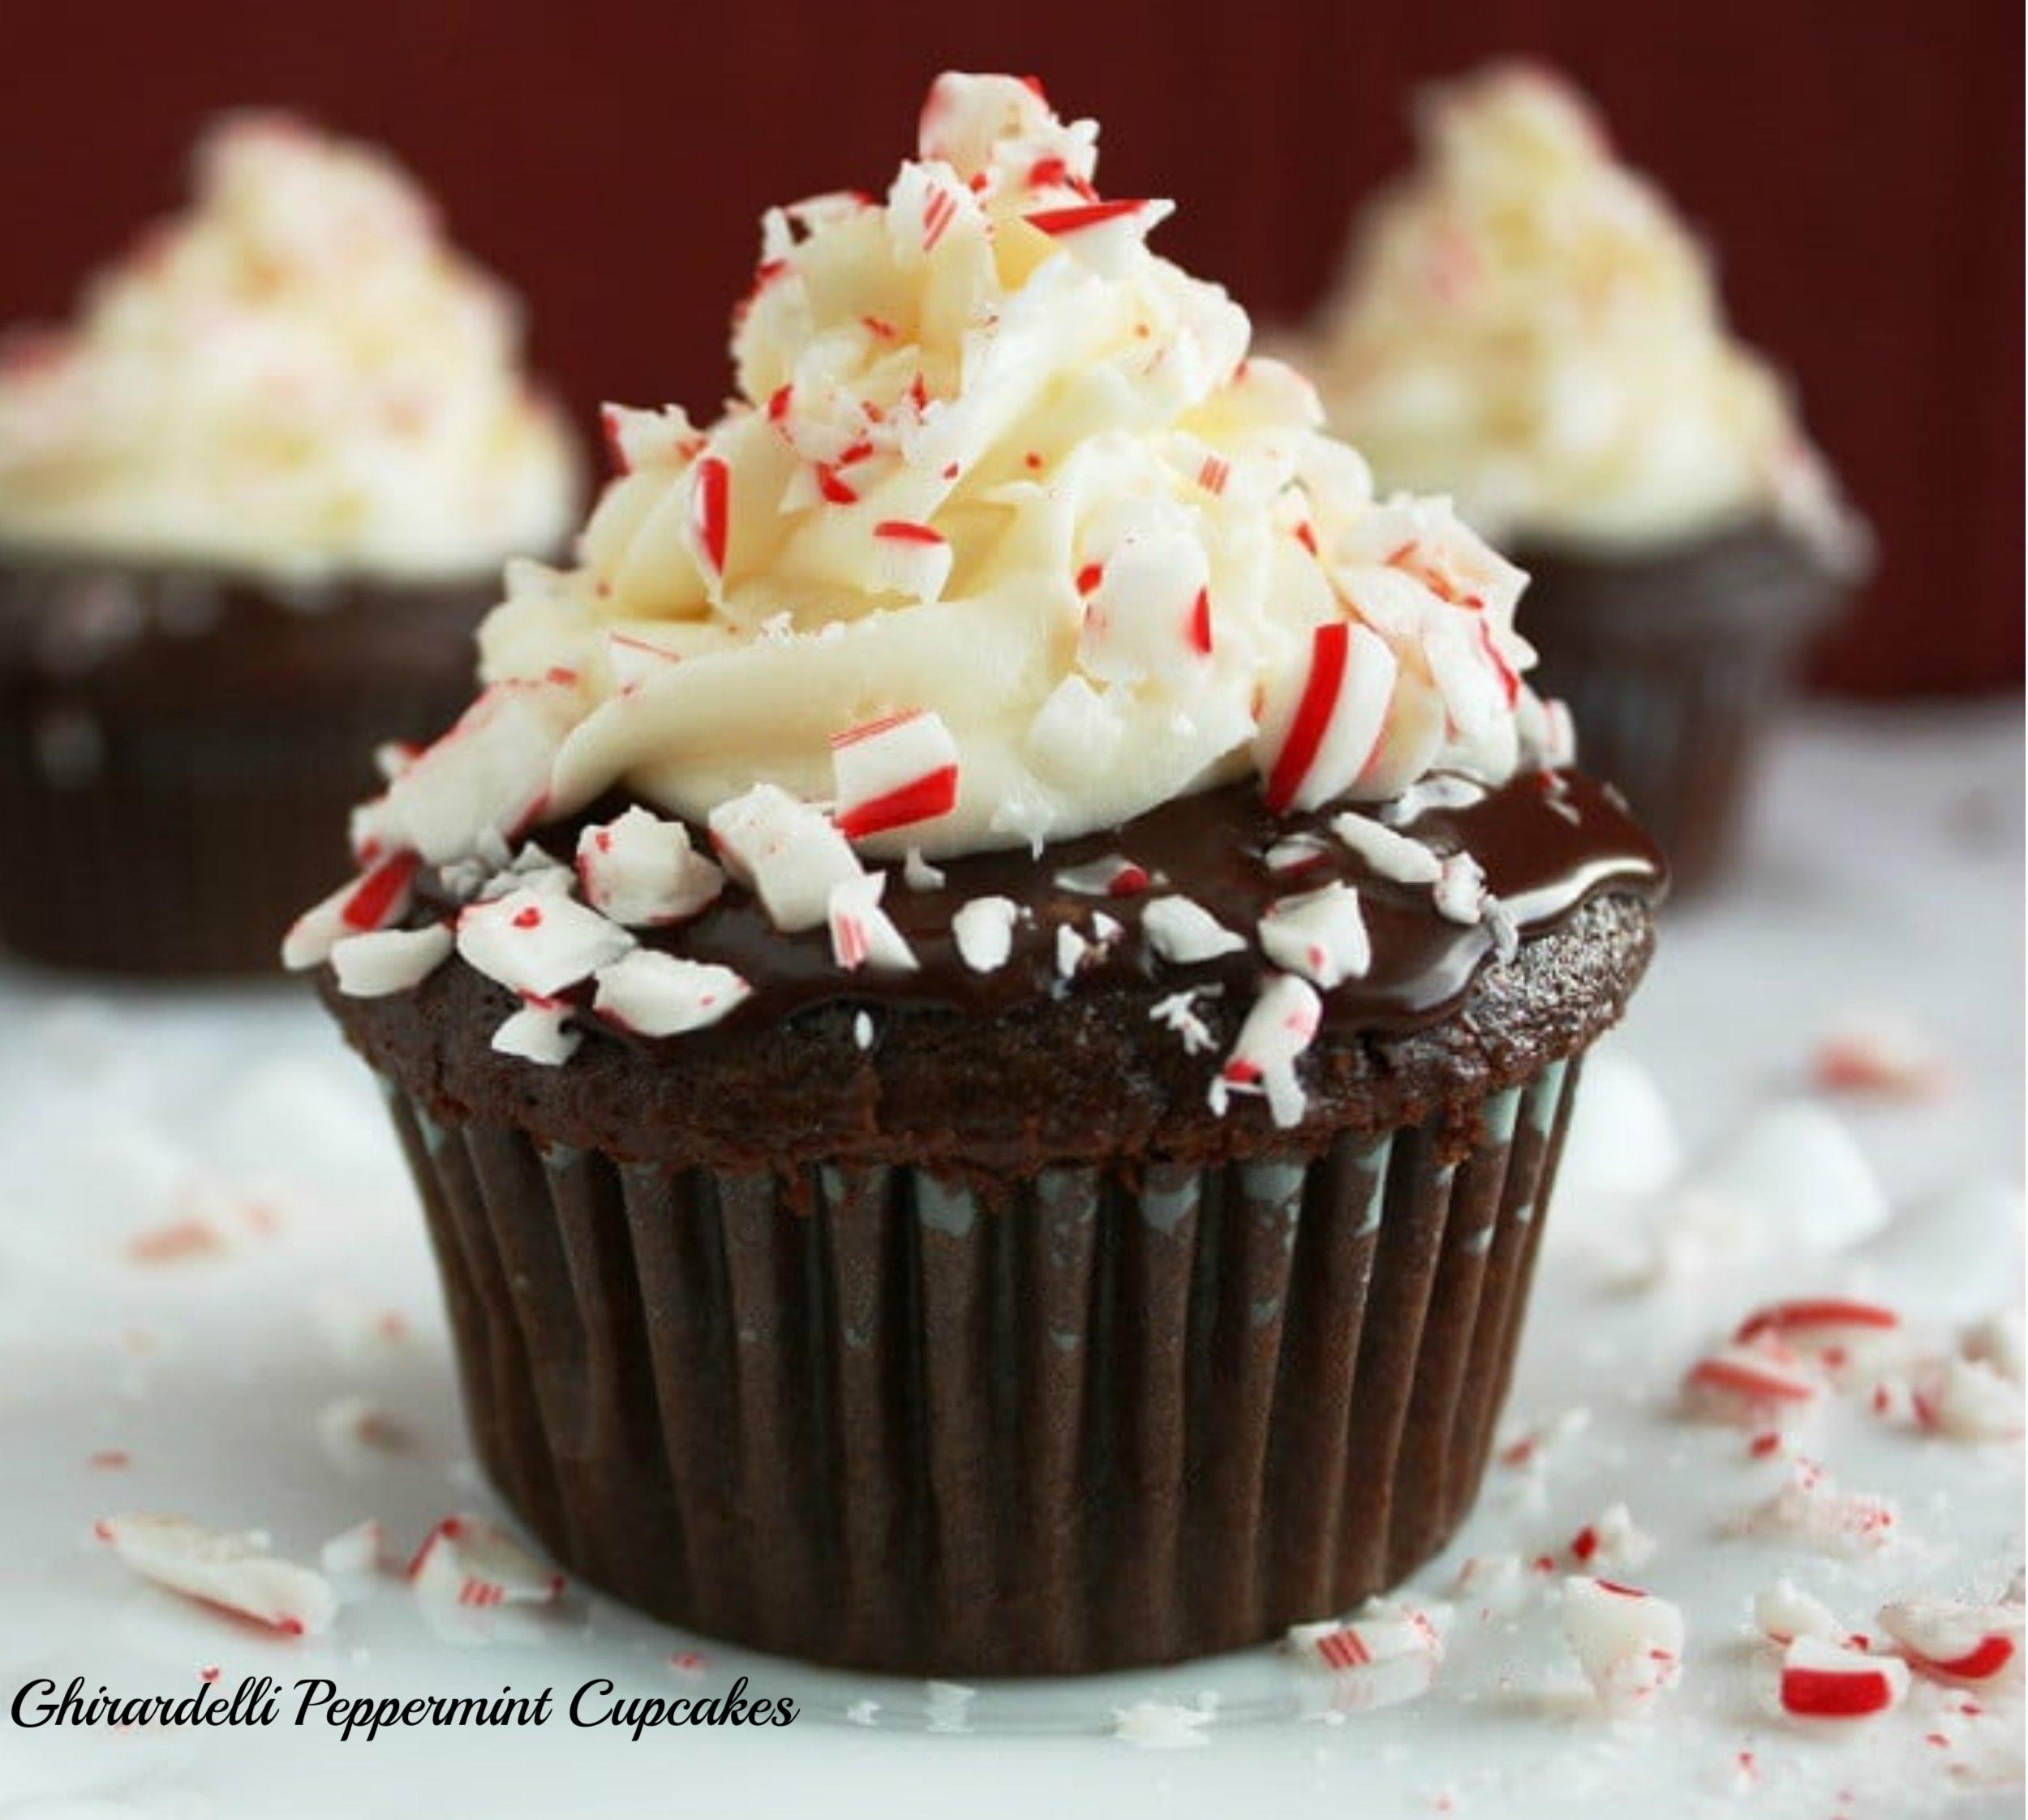 Ghirardelli Peppermint Cupcakes.jpeg